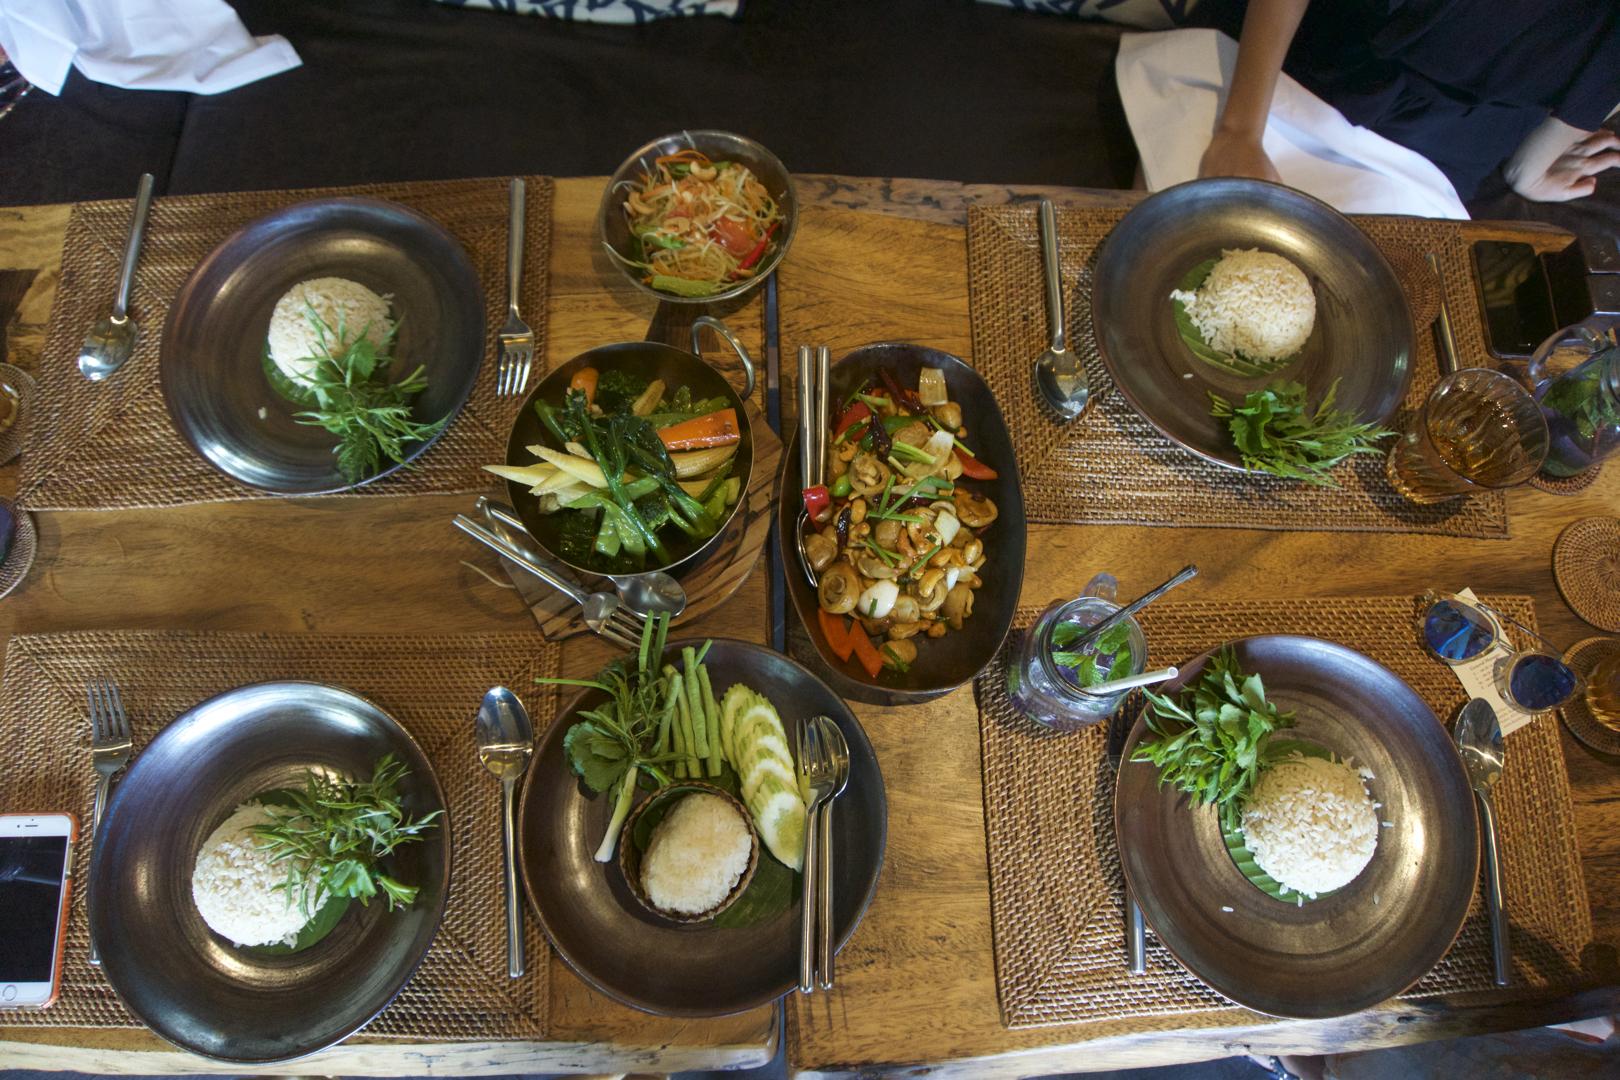 Lunch. Holistic, vegan, delicious!